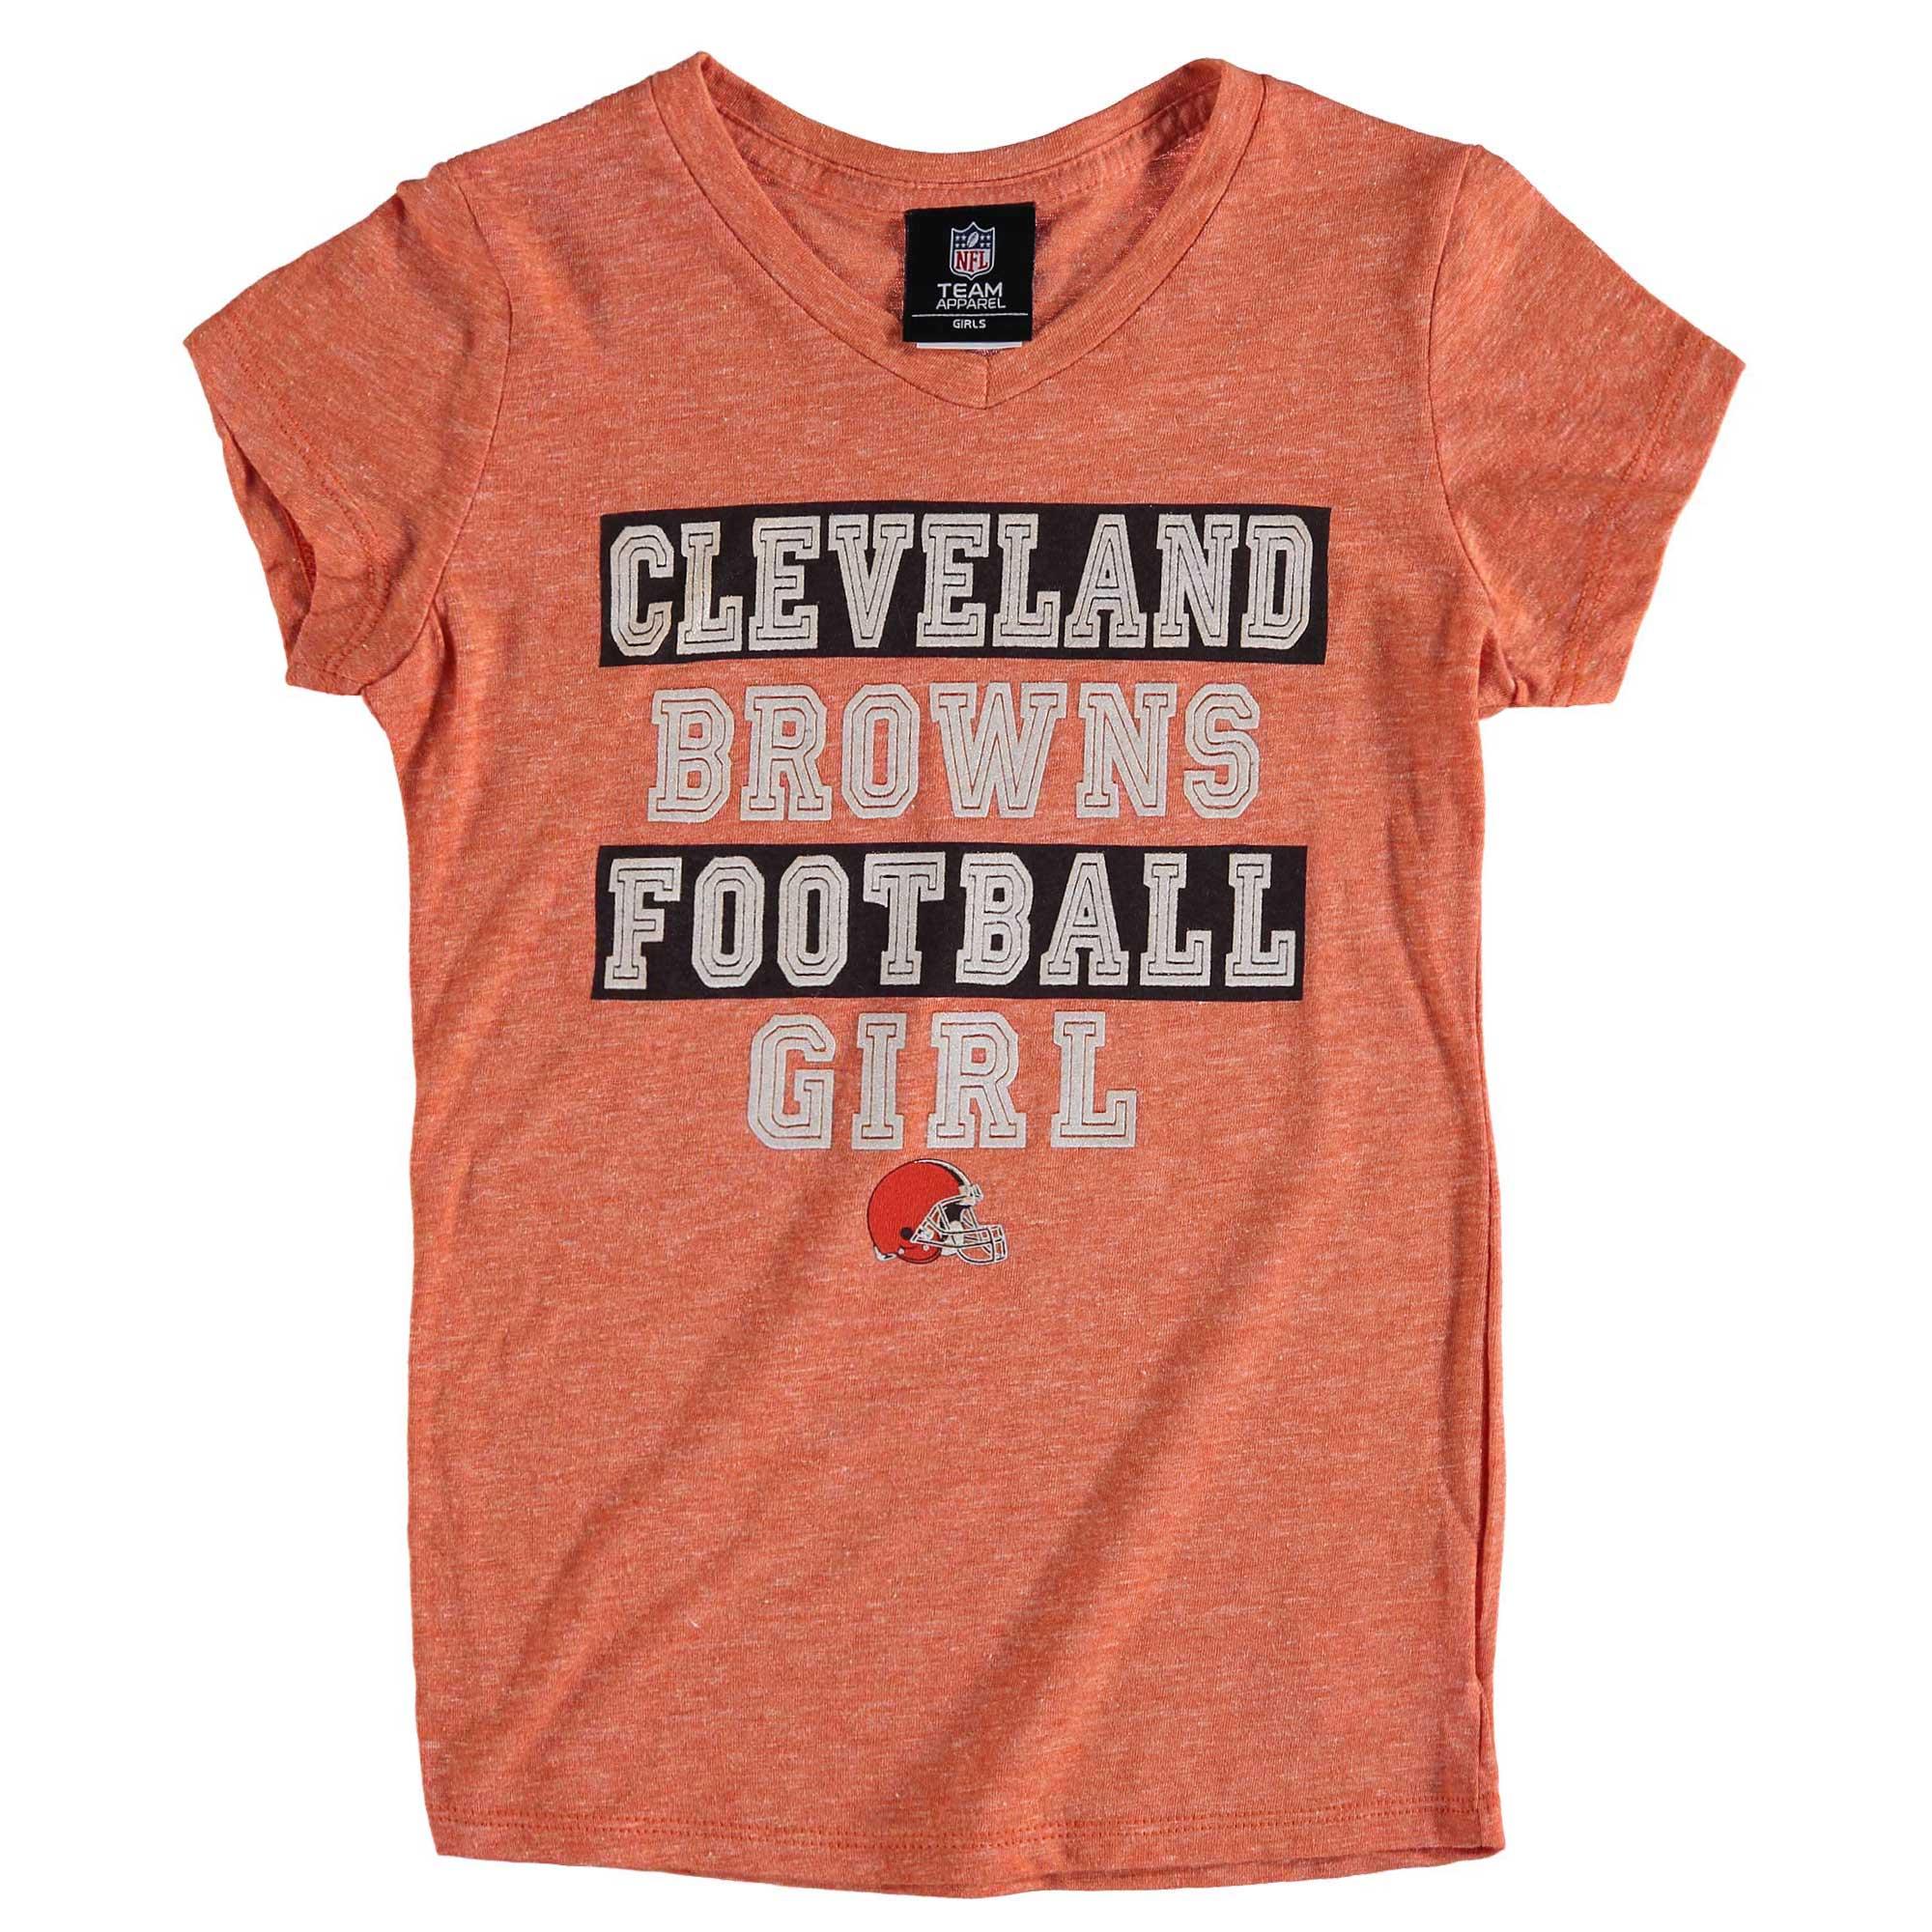 Cleveland Browns 5th & Ocean by New Era Girls Youth Football Girl Tri-Blend V-Neck T-Shirt - Orange